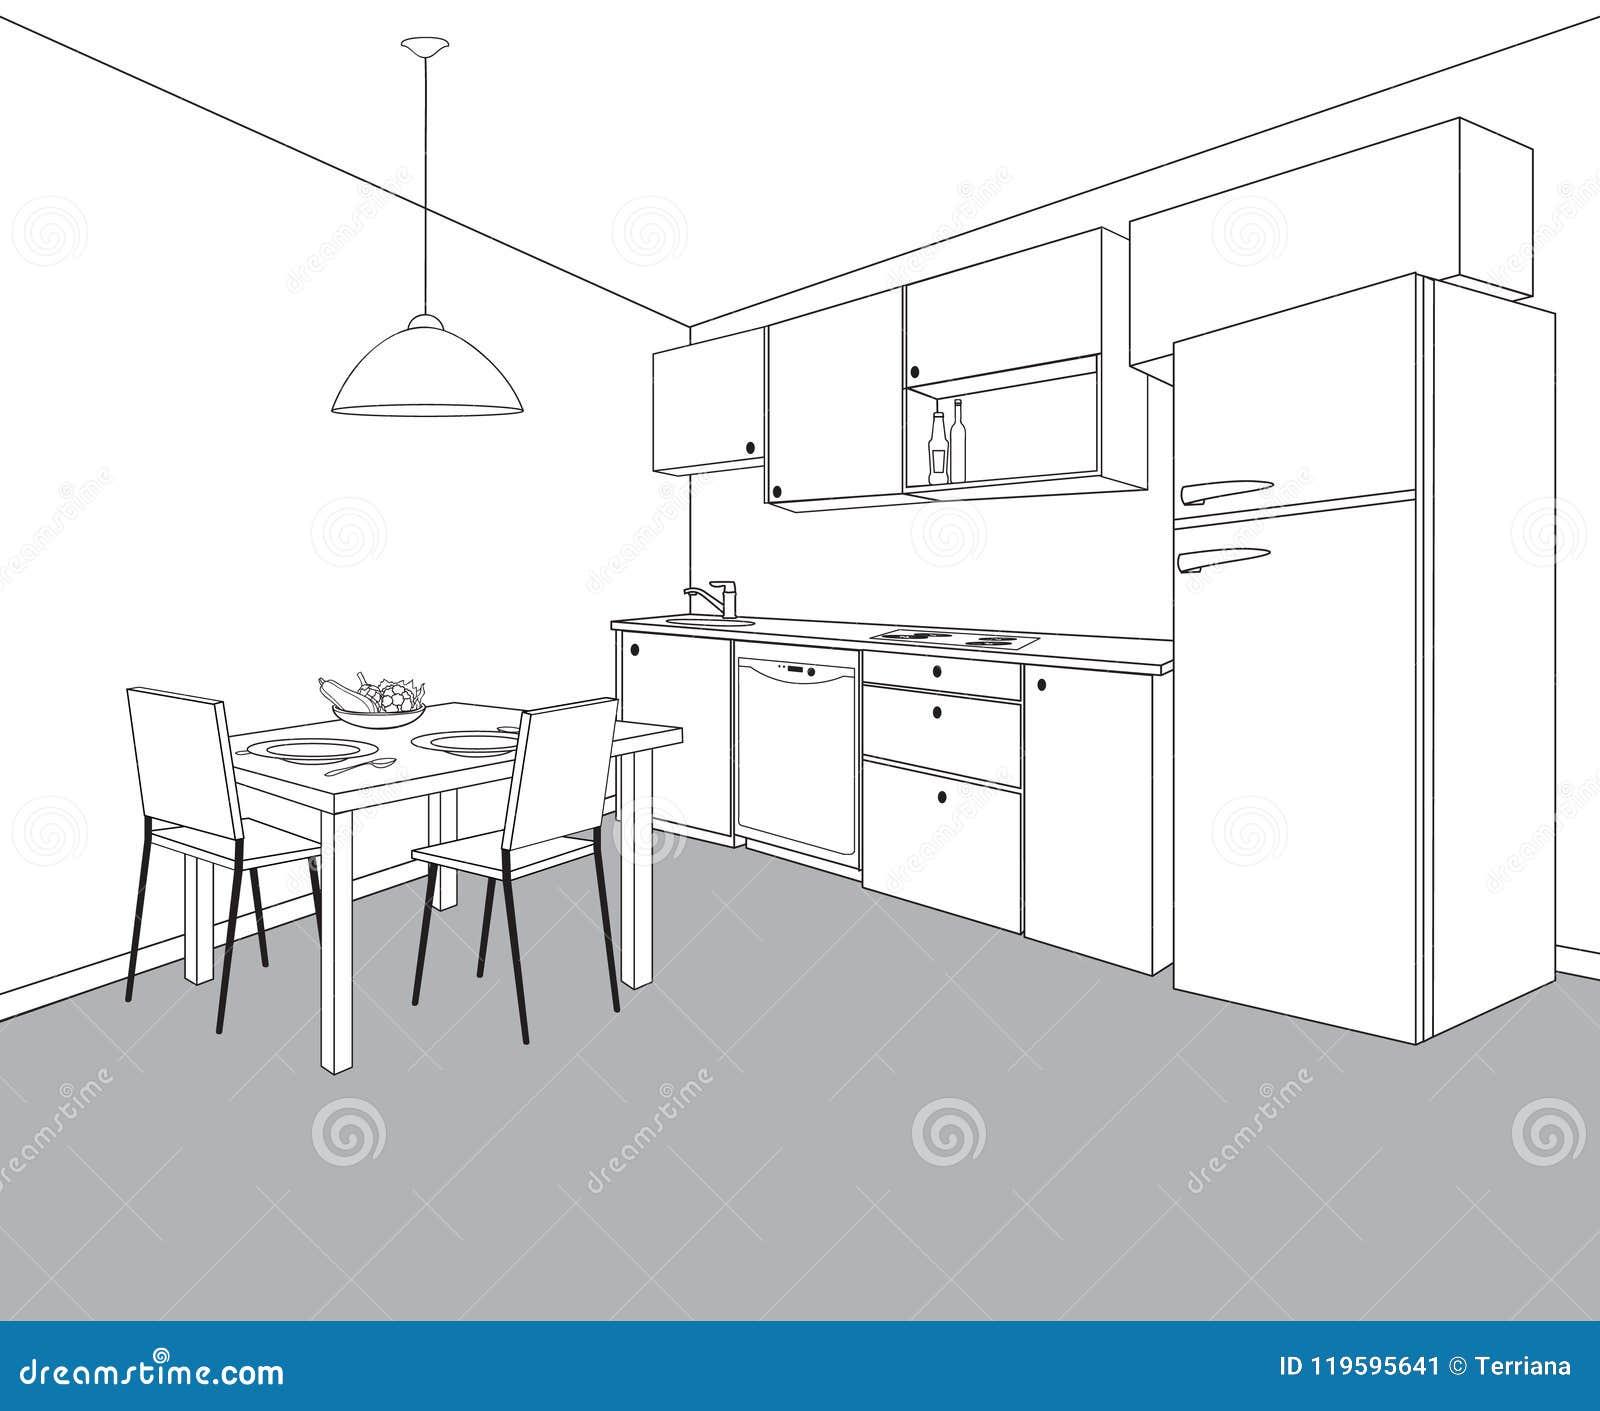 Interior of kitchen room kitchen outline furniture design stock interior sketch of kitchen room outline blueprint design of kitchen with modern furniture and dining table malvernweather Gallery